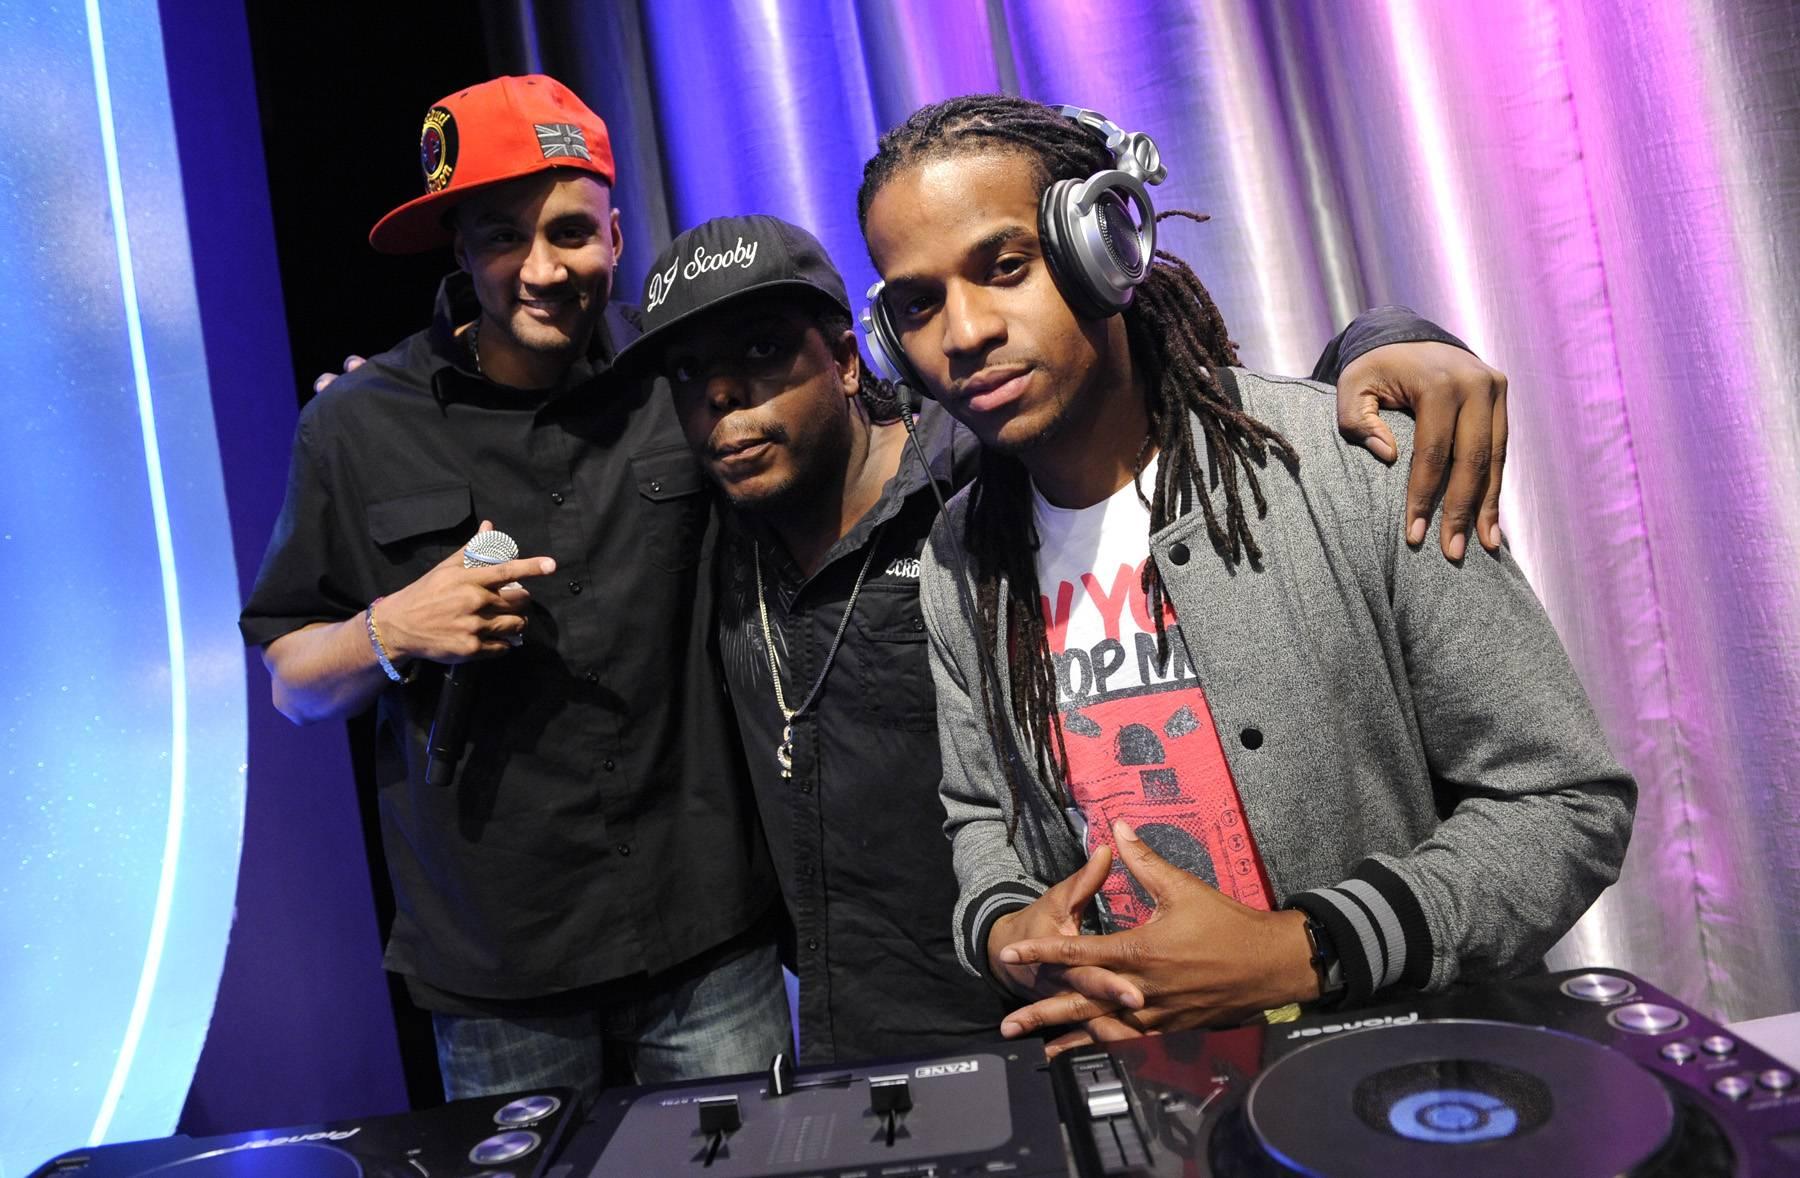 DJ Respect - DJ Spynfo and DJ Lyve at 106 & Park, May 3, 2012. (Photo: John Ricard / BET)